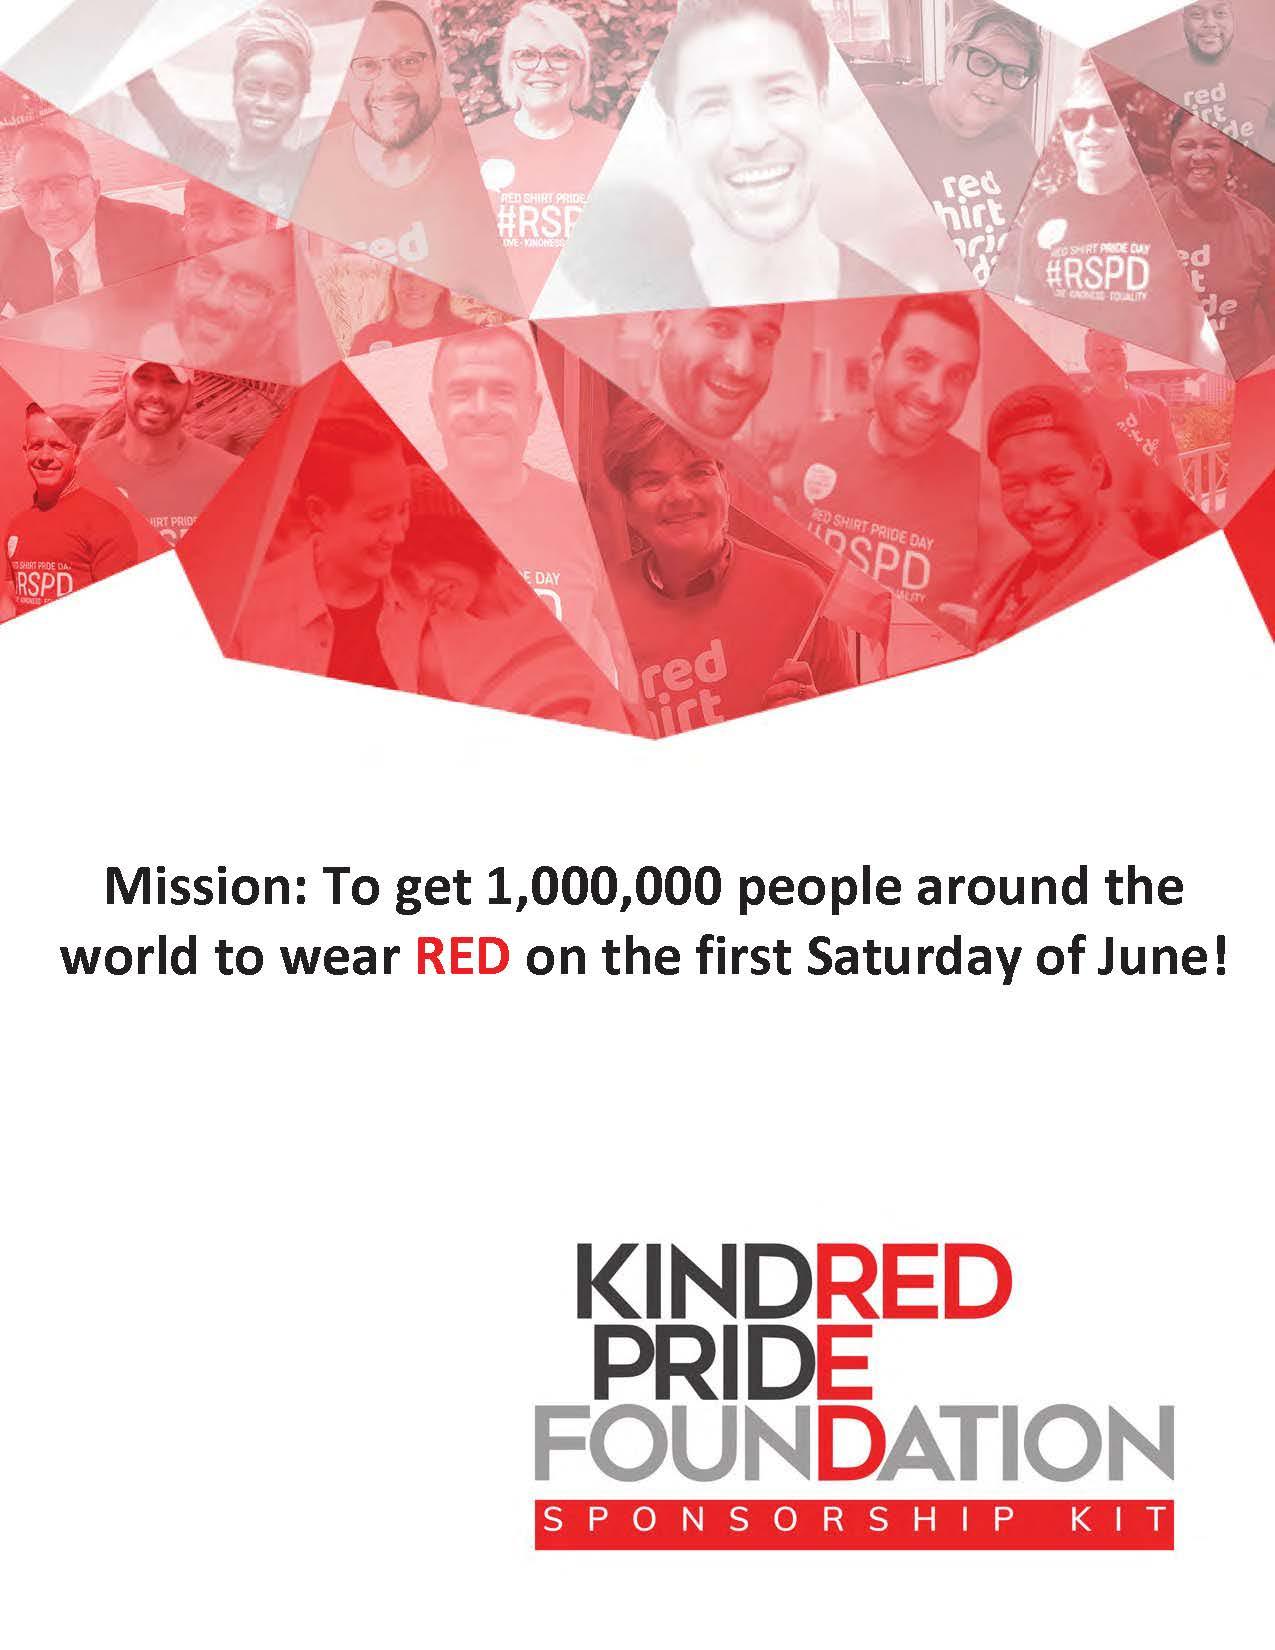 outloud enterprises KindRED Pride Foundation sponsorship 2020 thumbnail graphic